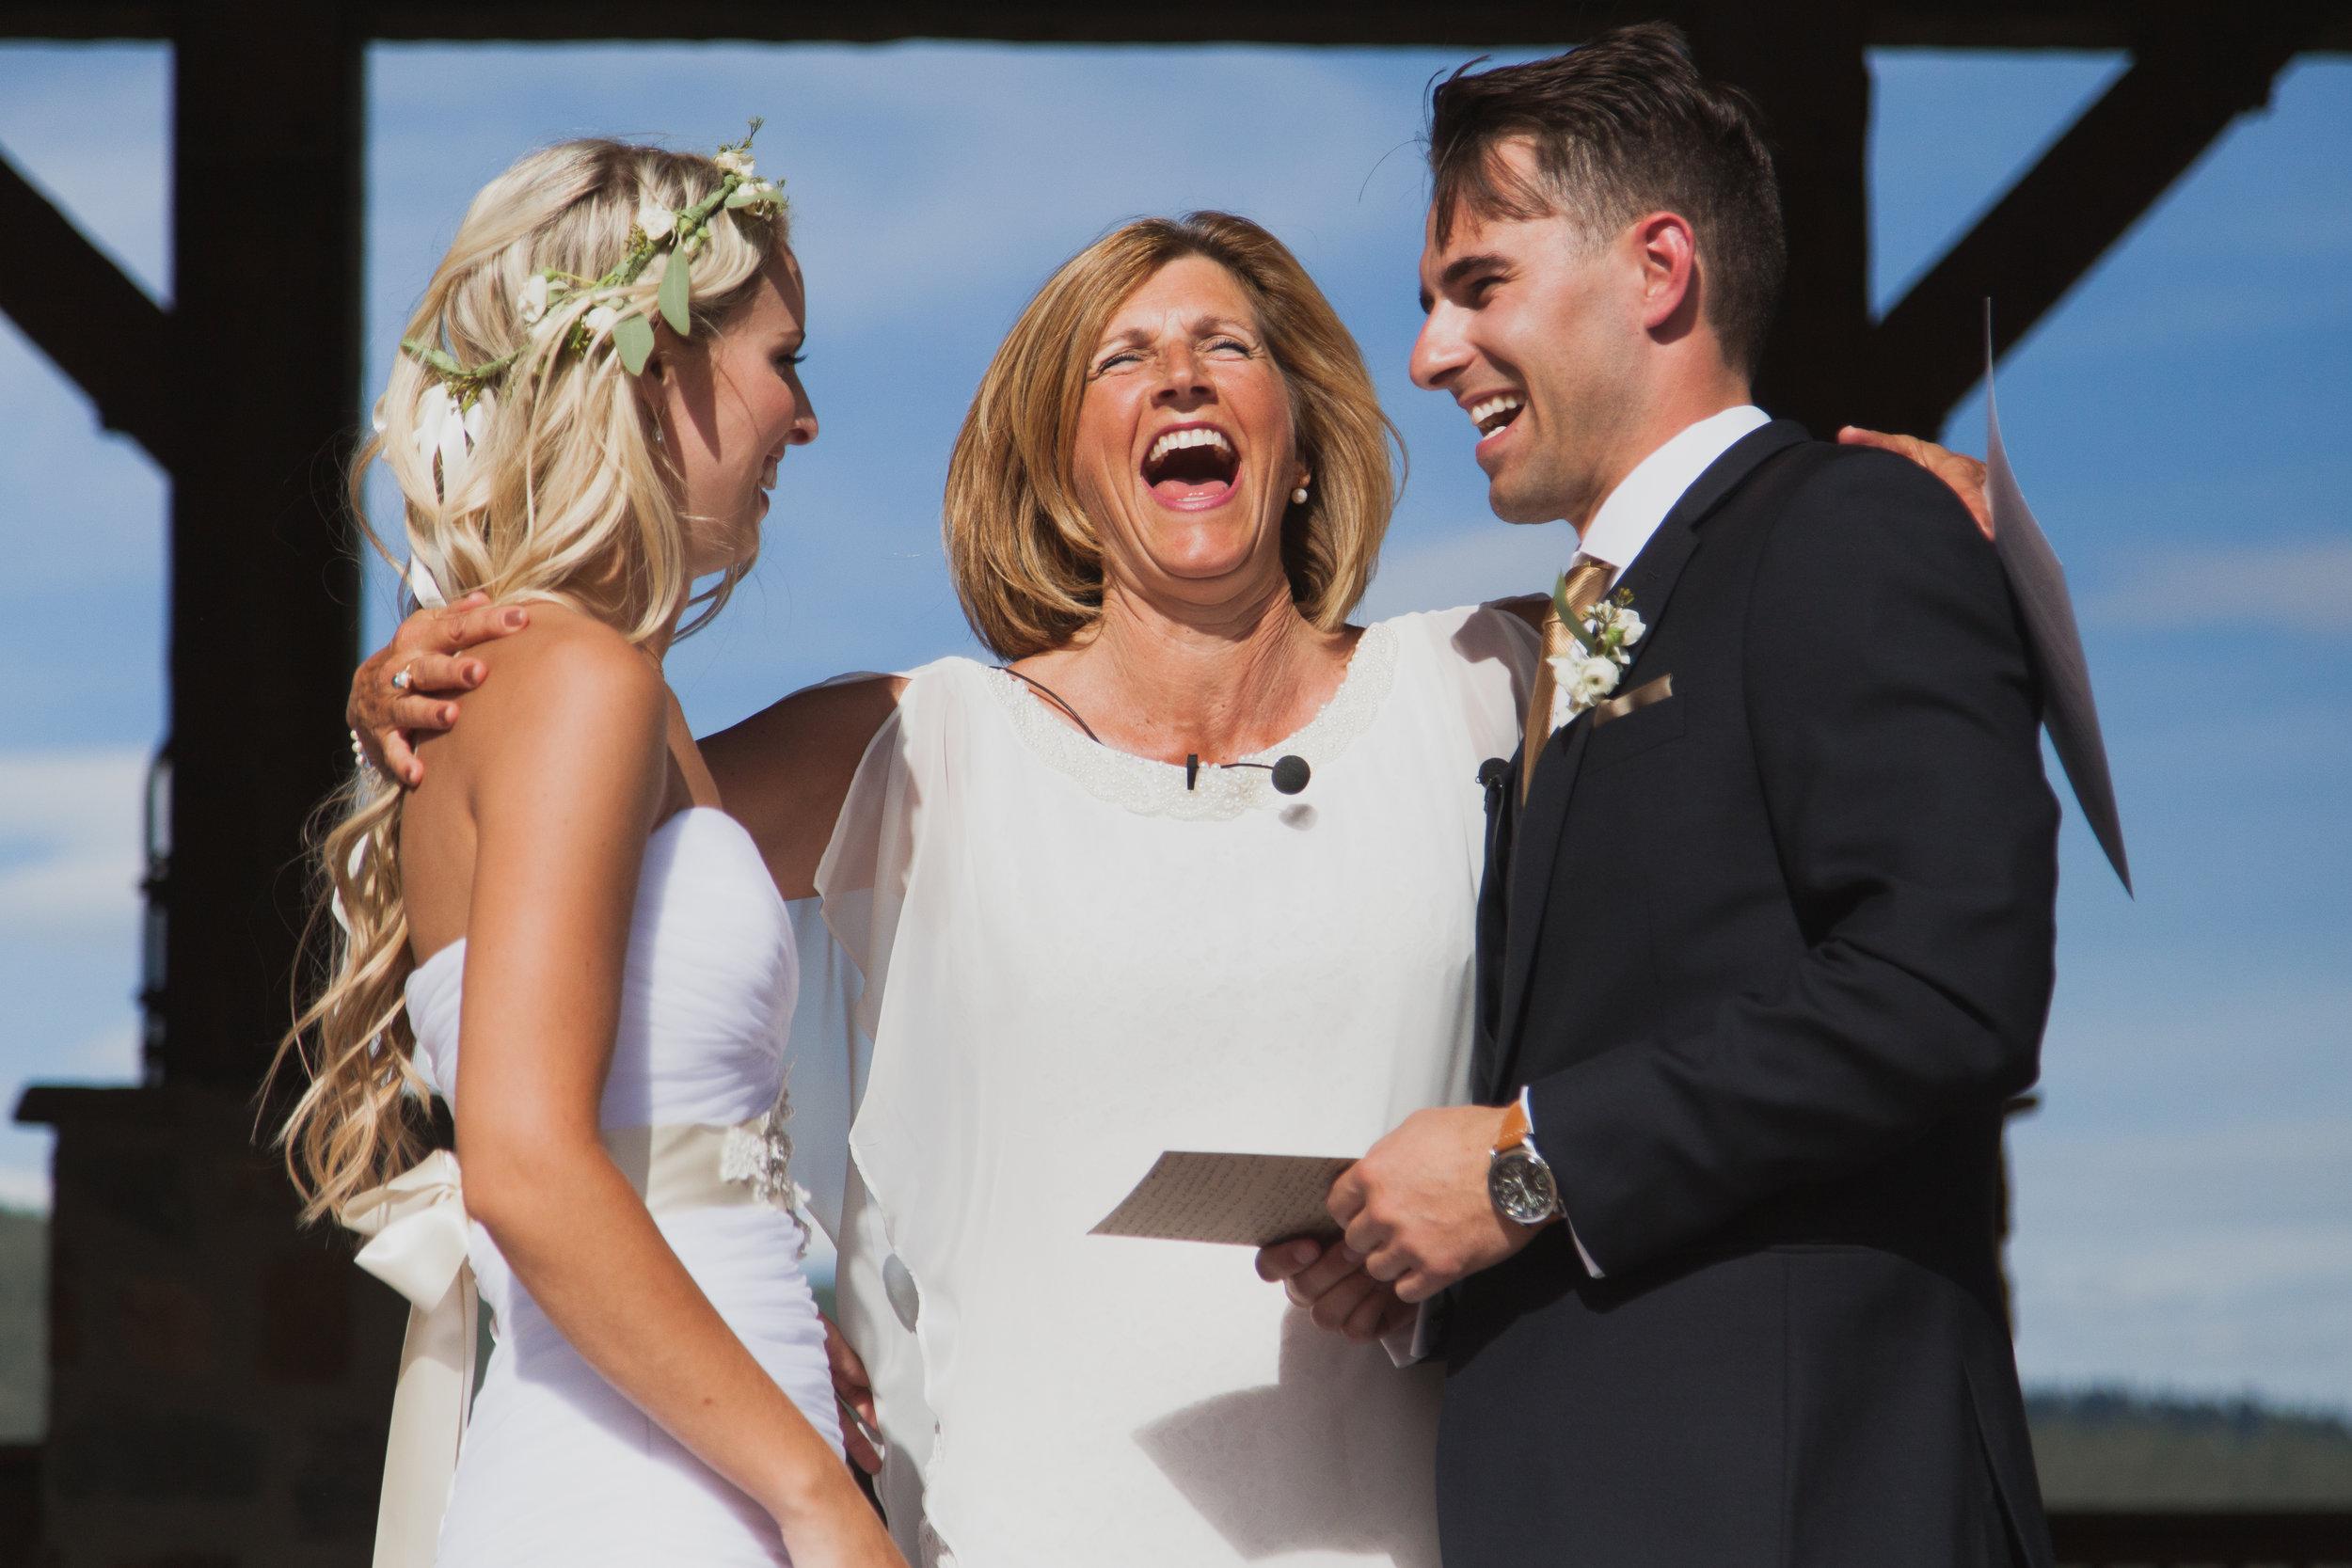 WEYER-WEDDING-DANCING-37.jpg